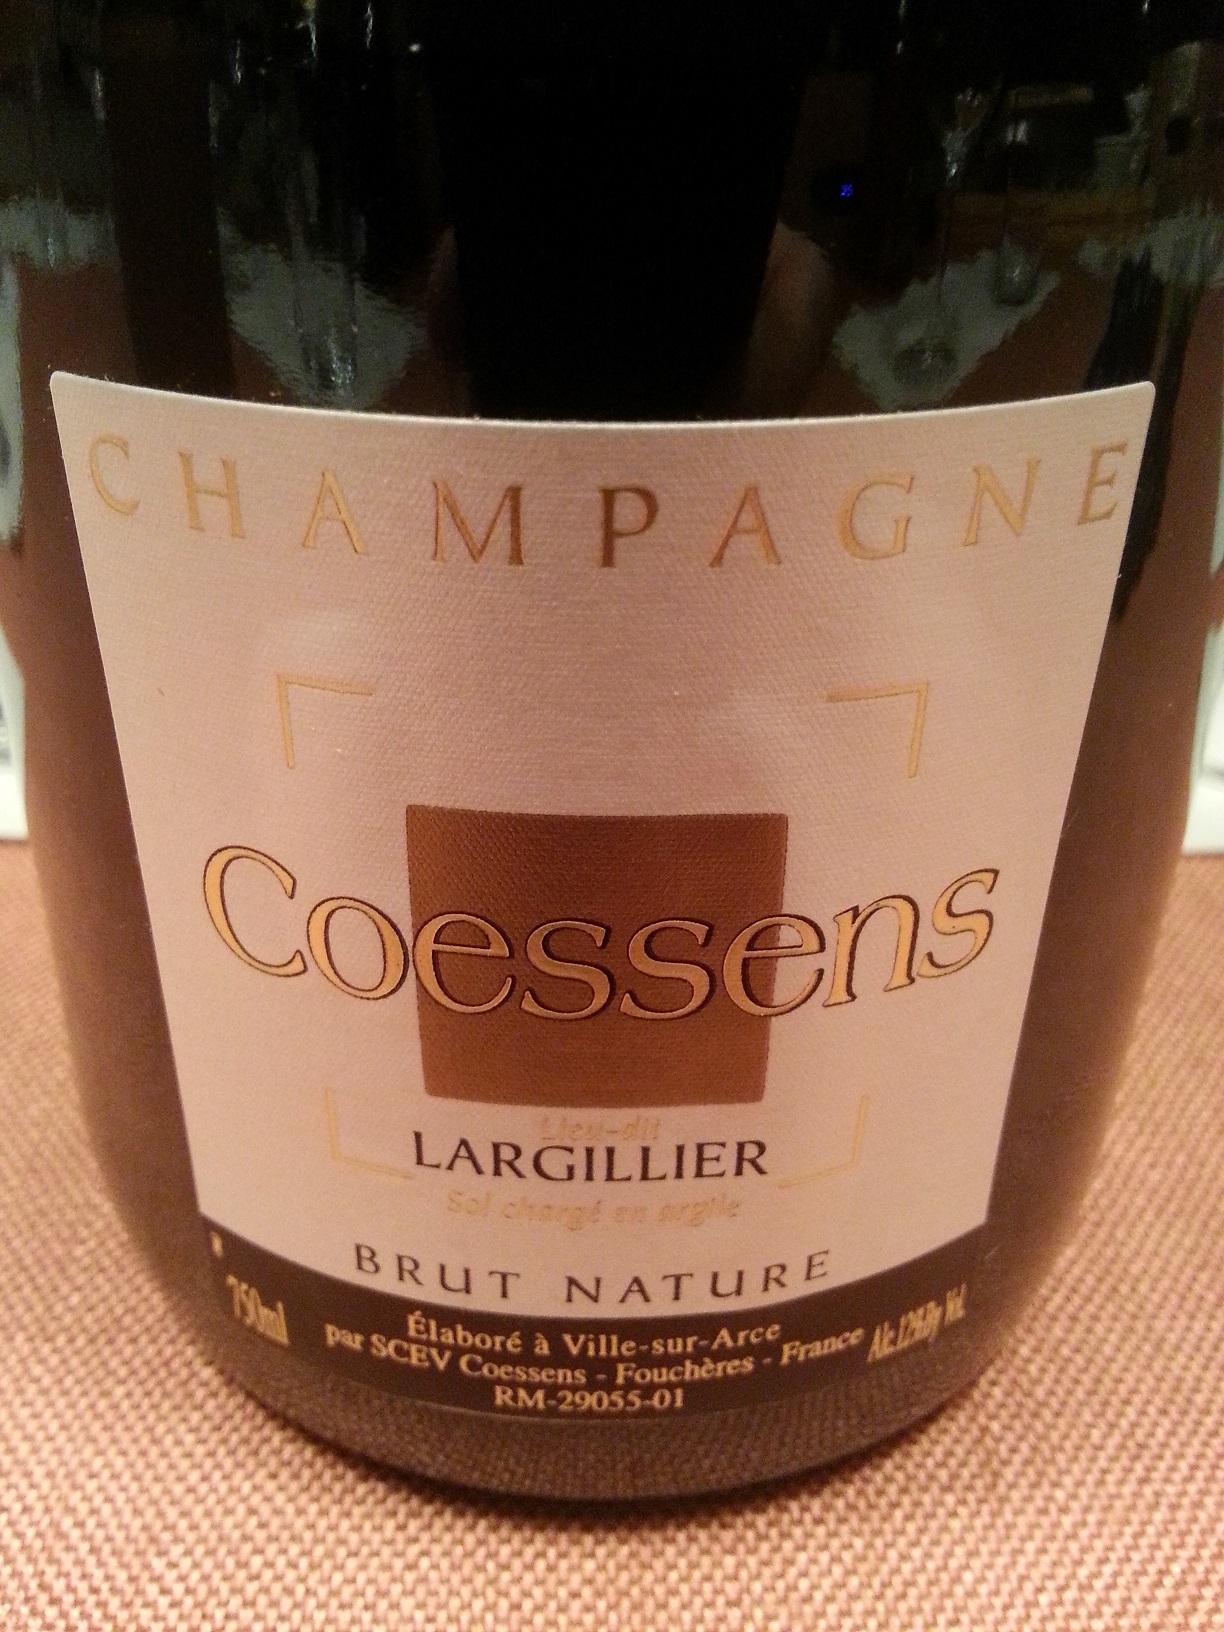 -nv- Champagne Largillier brut nature | Coessens